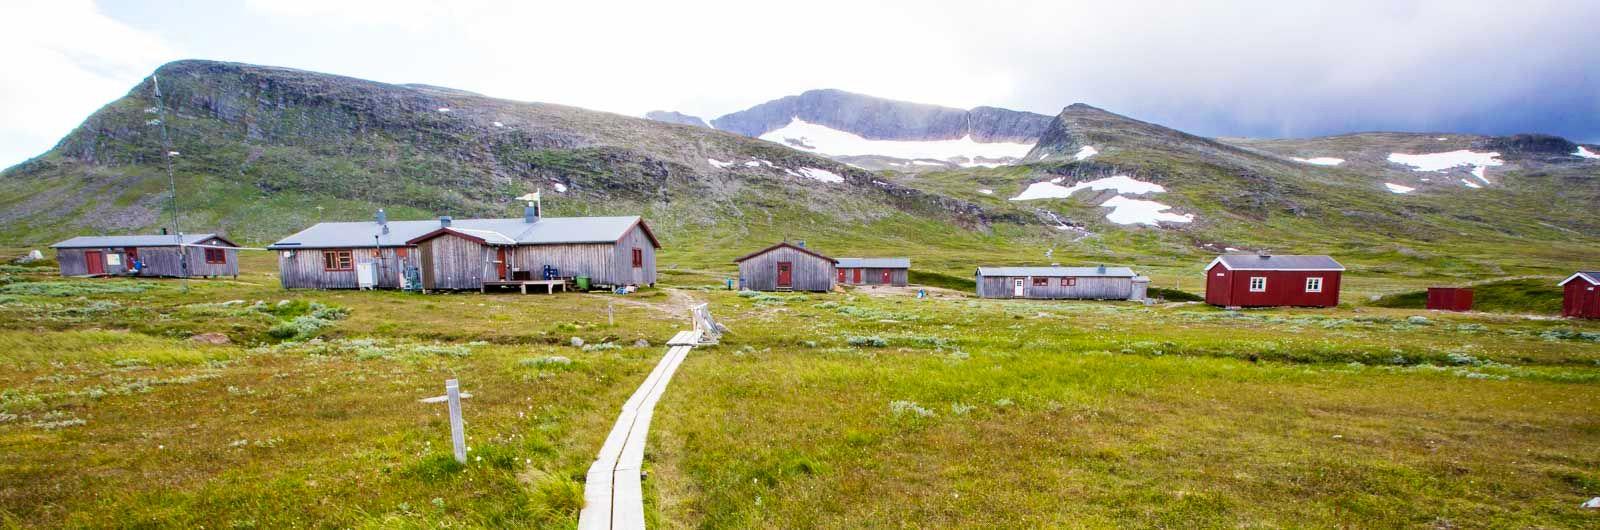 Stugor längs leden Storulvån-Vålådalen